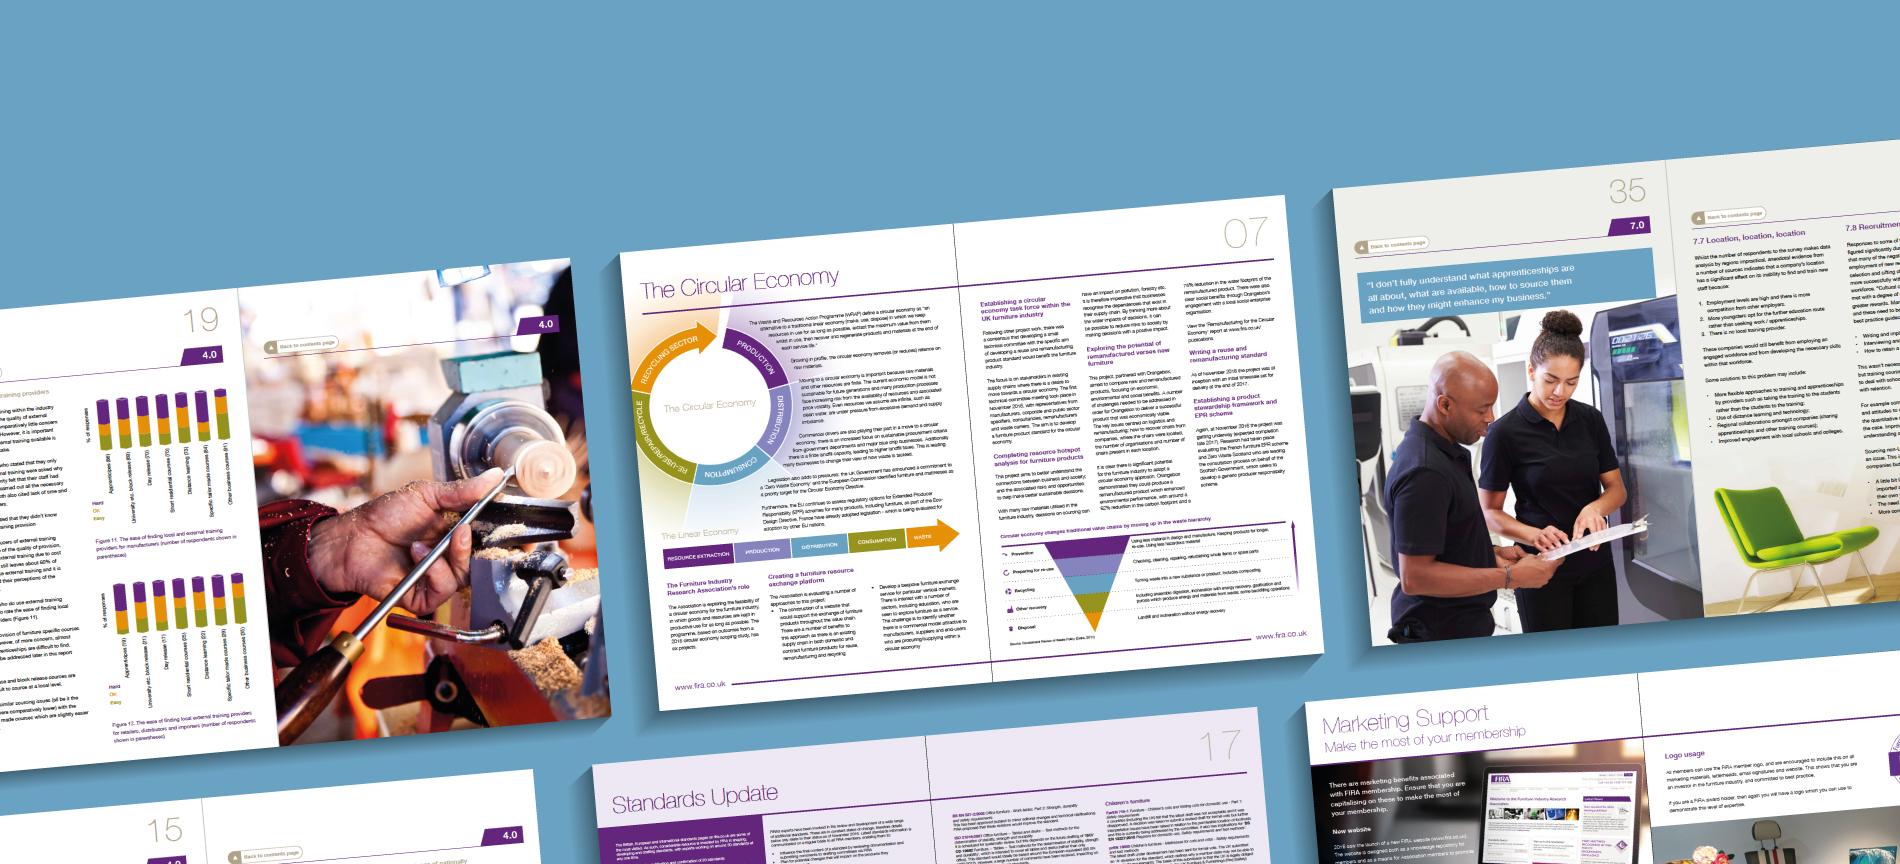 FIRA case study images on a blue background - desktop